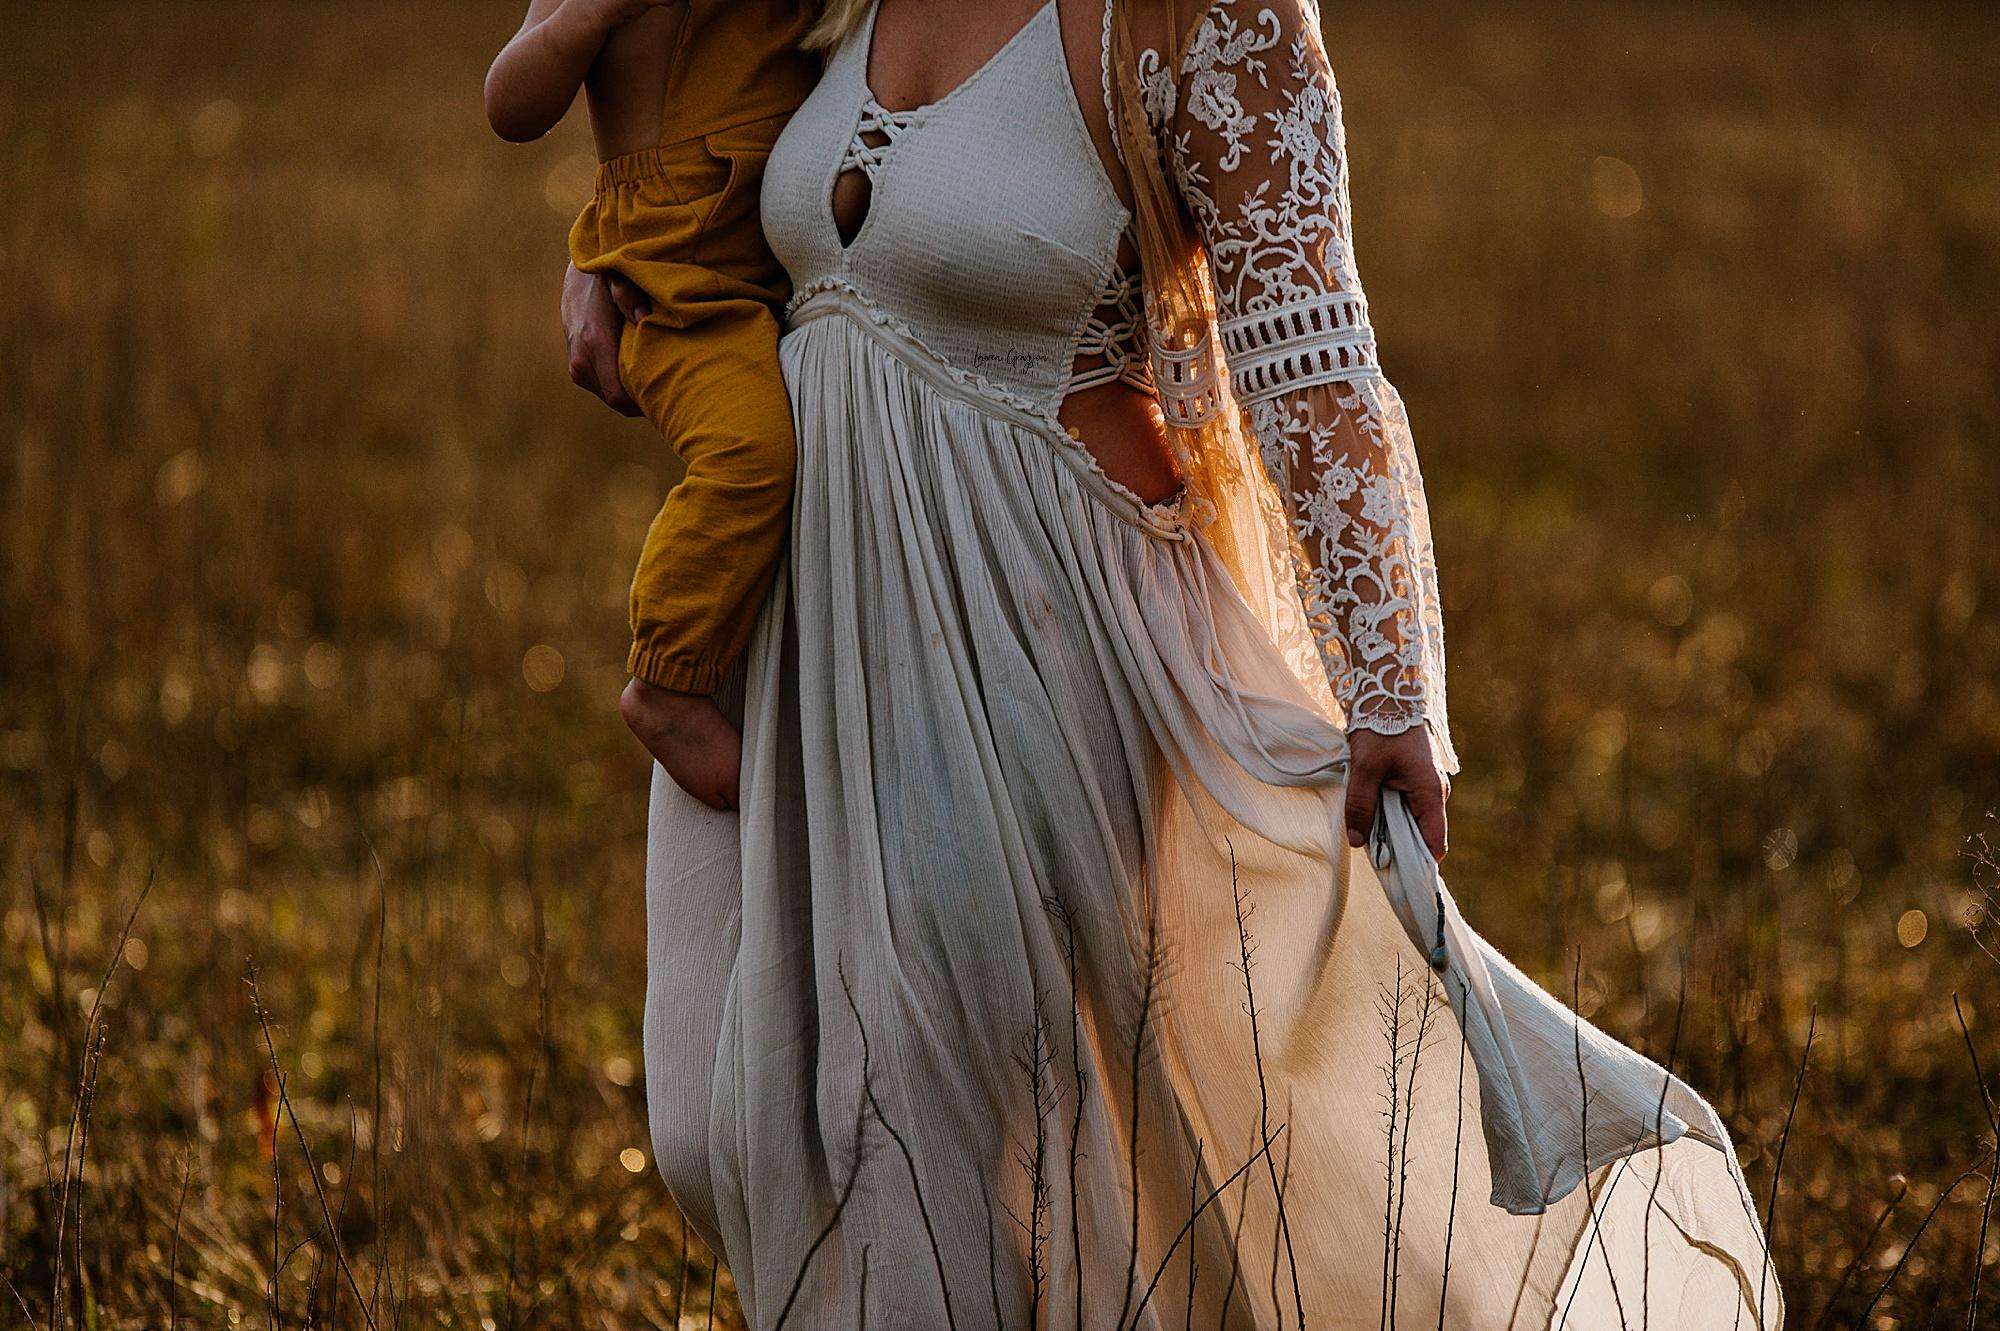 lauren-grayson-photography-akron-ohio-family-mom-boys-field-spring-outdoor-session_0001.jpg